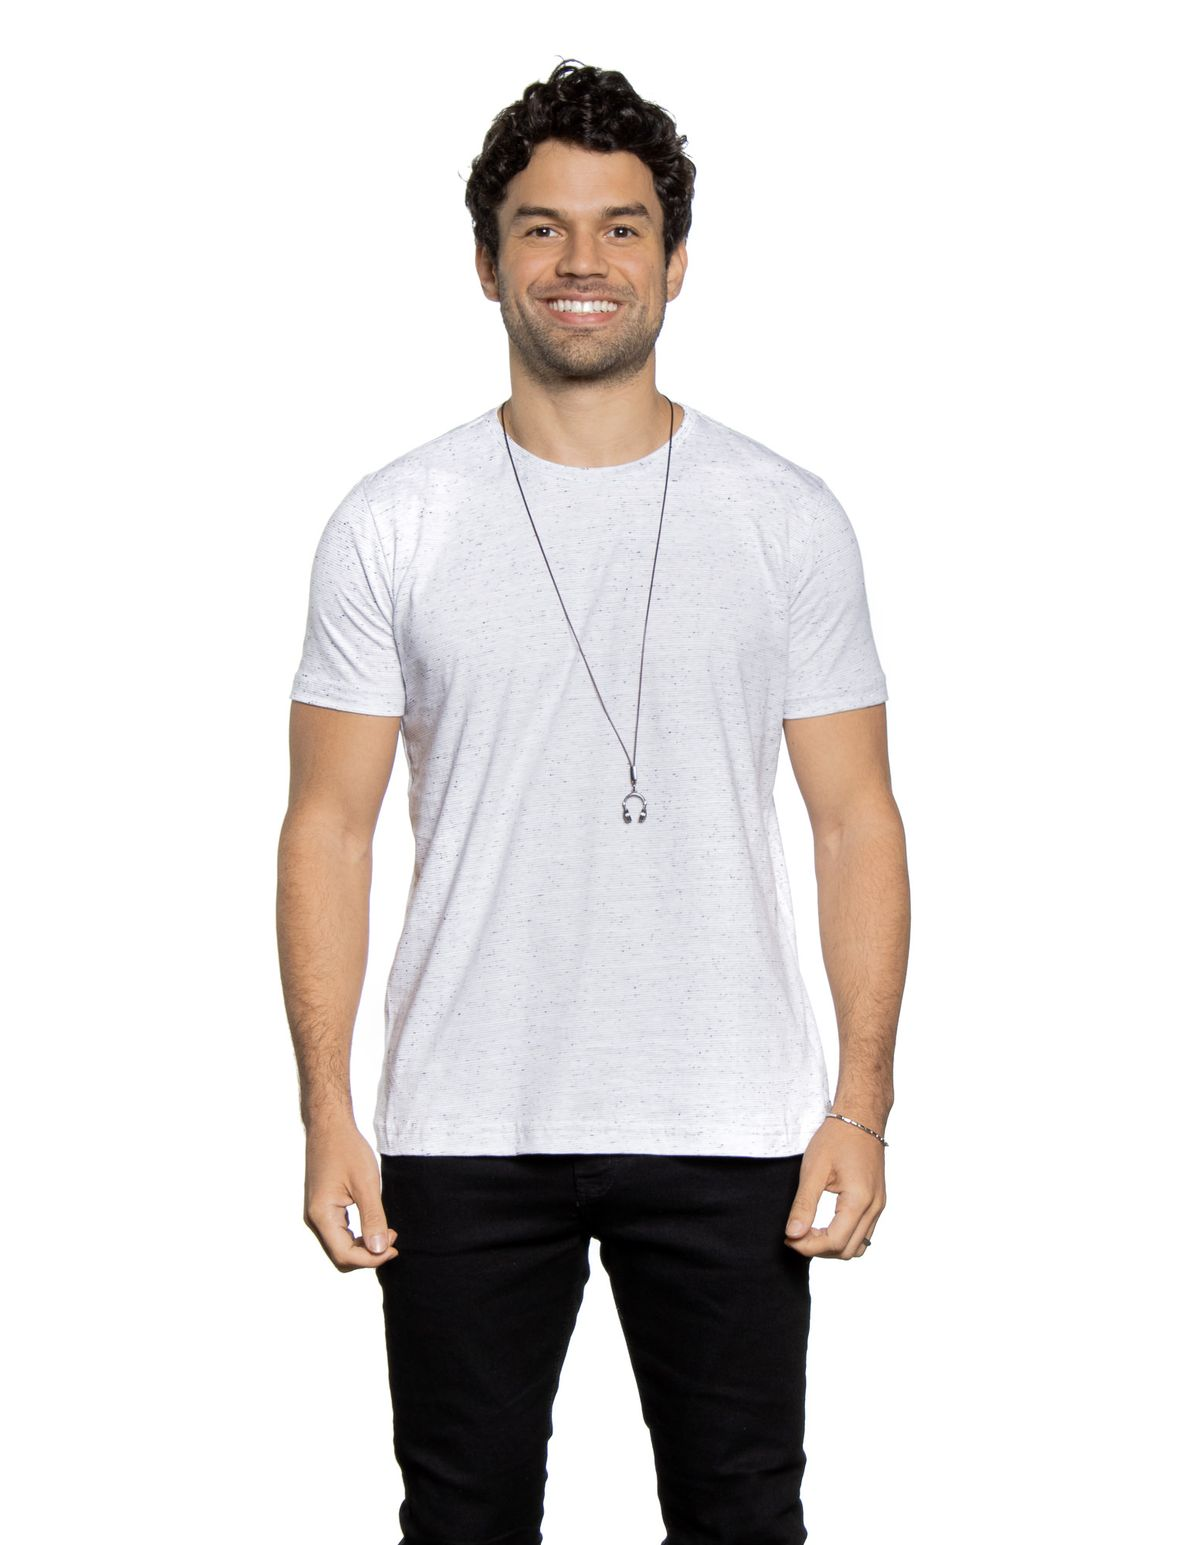 511528029-camiseta-manga-curta-masculina-basica-botone-mescla-banana-p-194